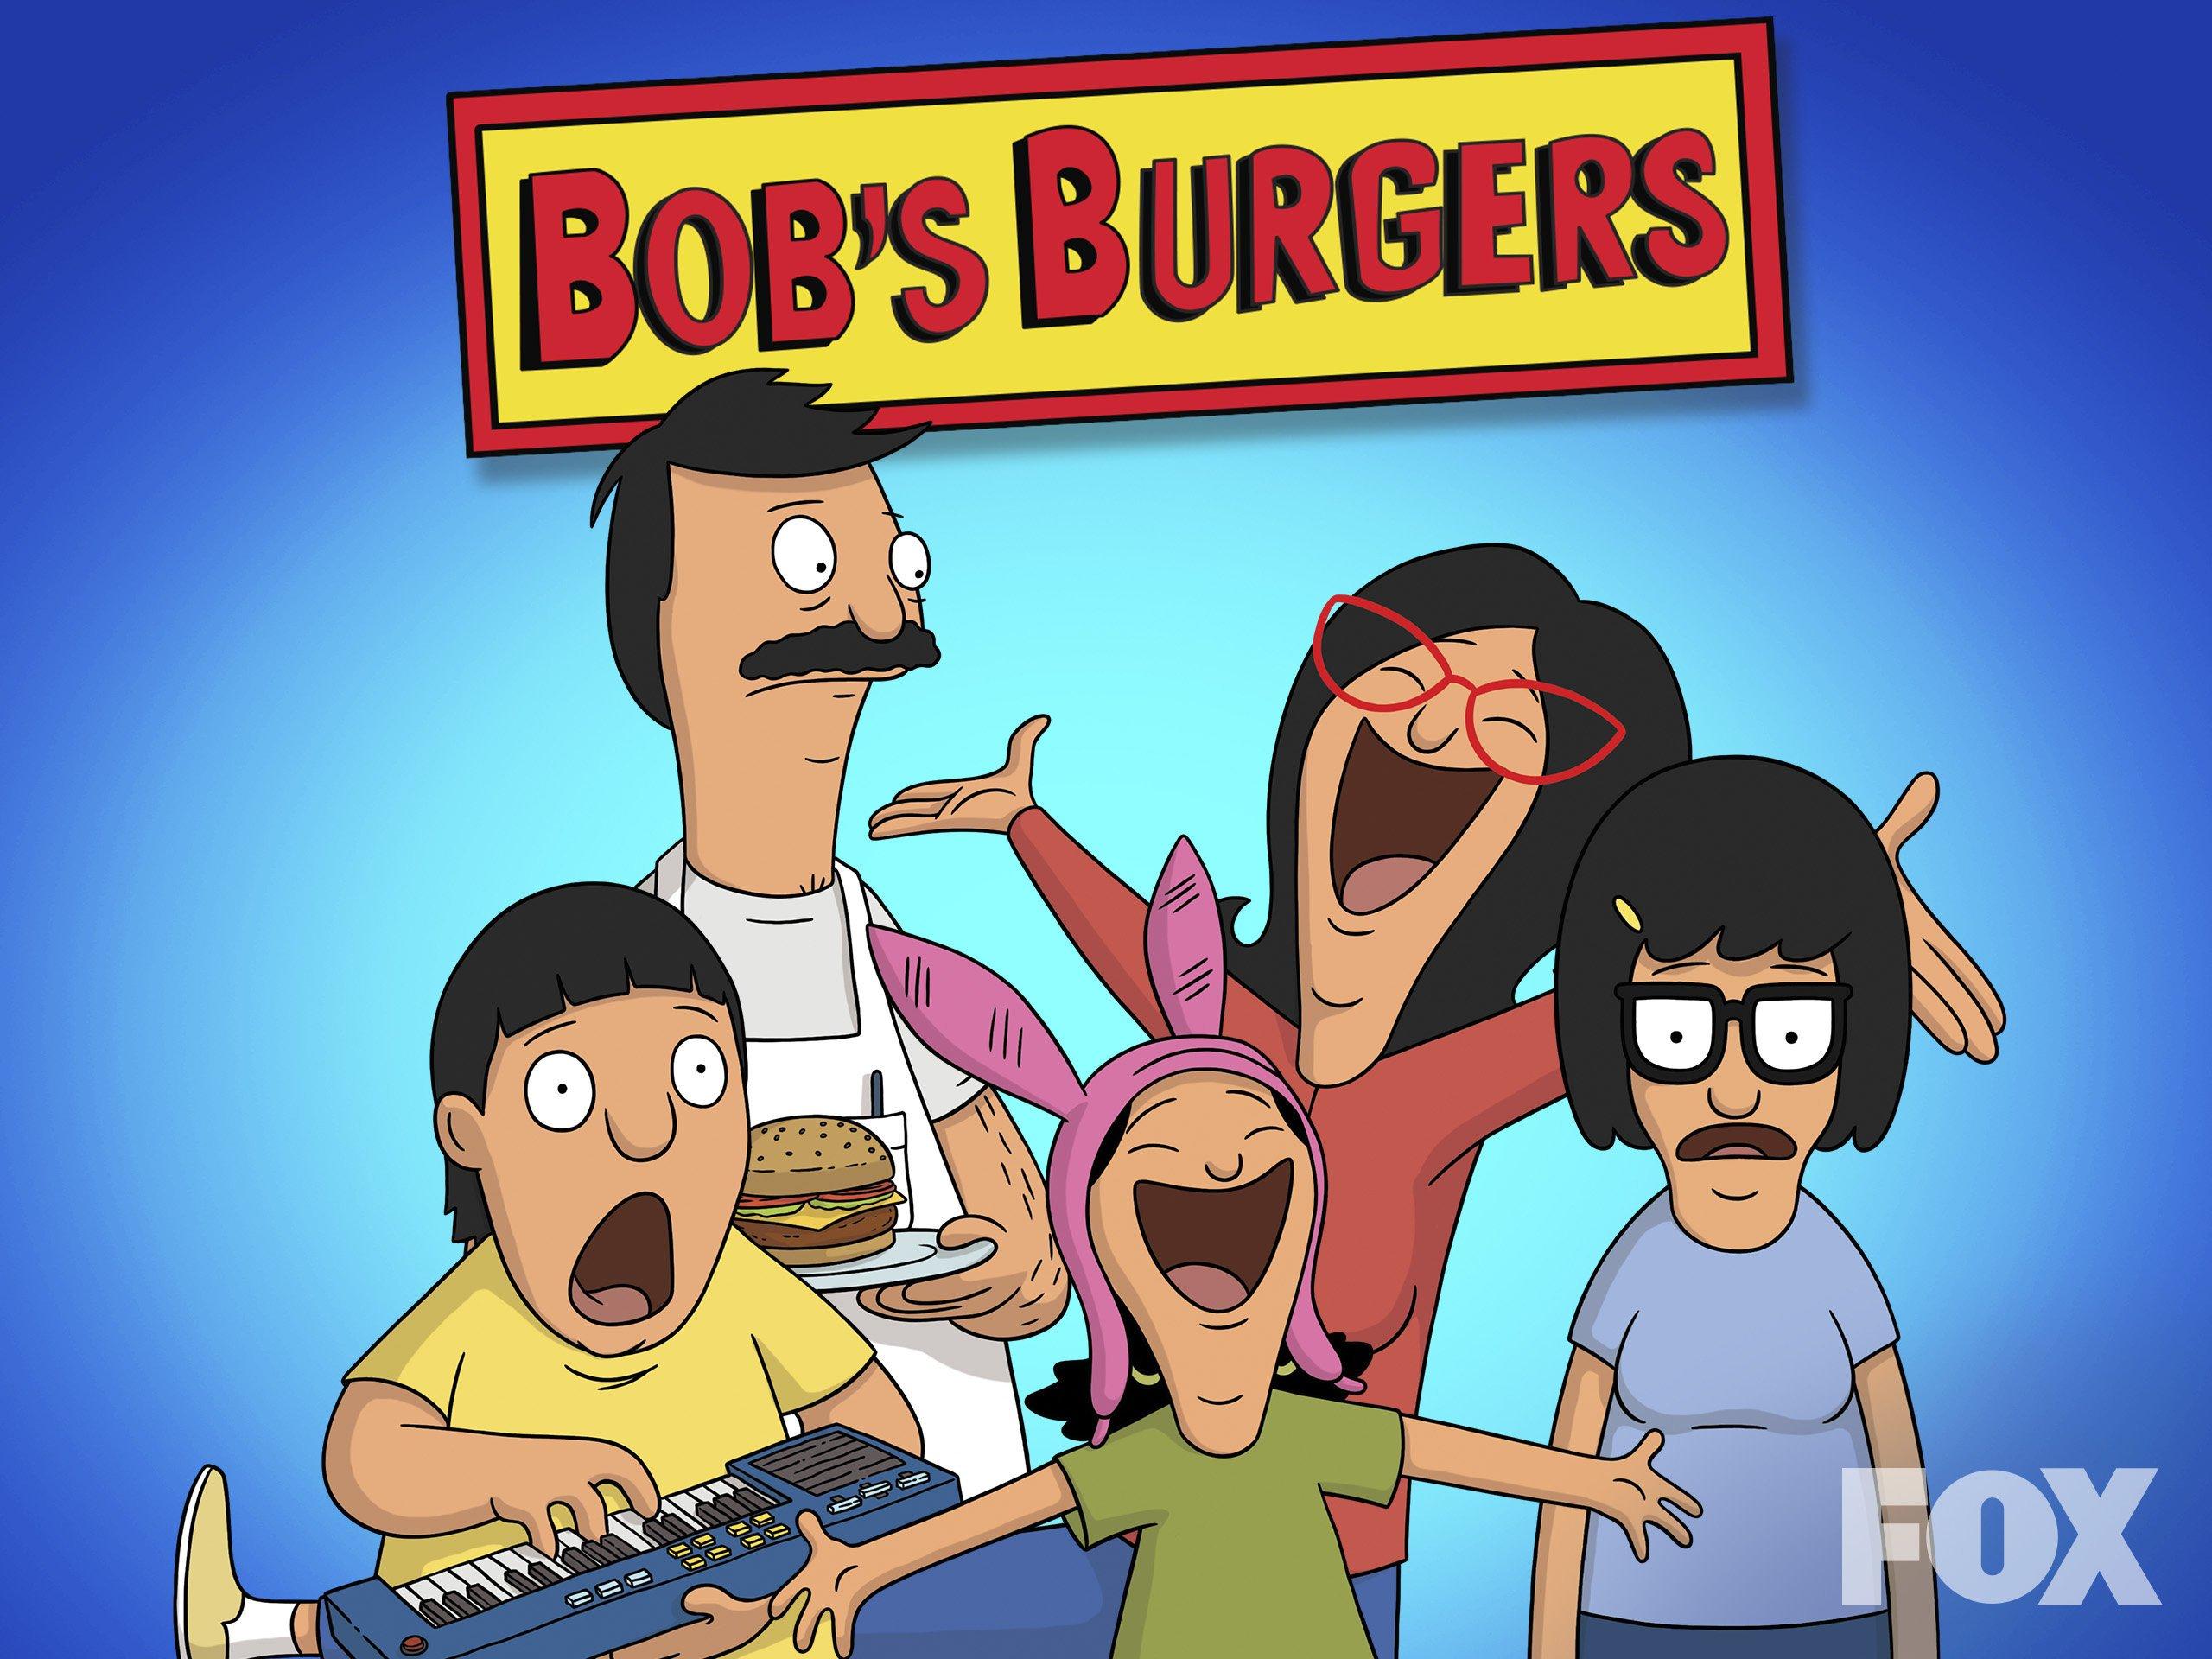 Amazon Bobs Burgers Season 5 Digital Services LLC